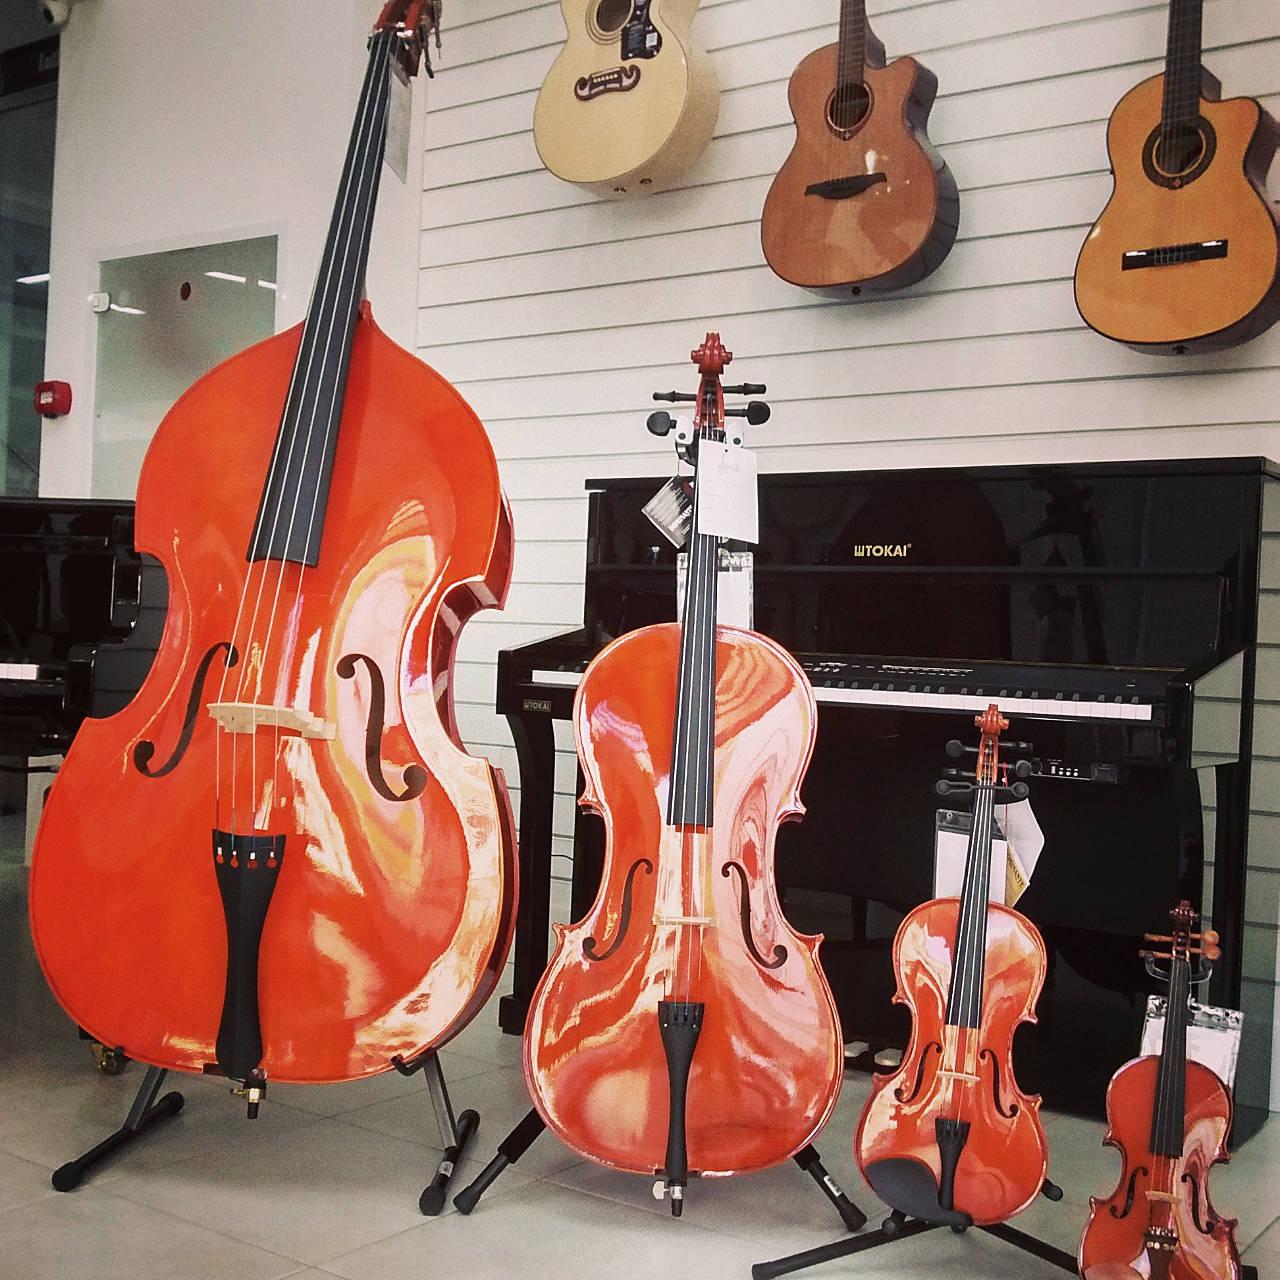 The Violin Family